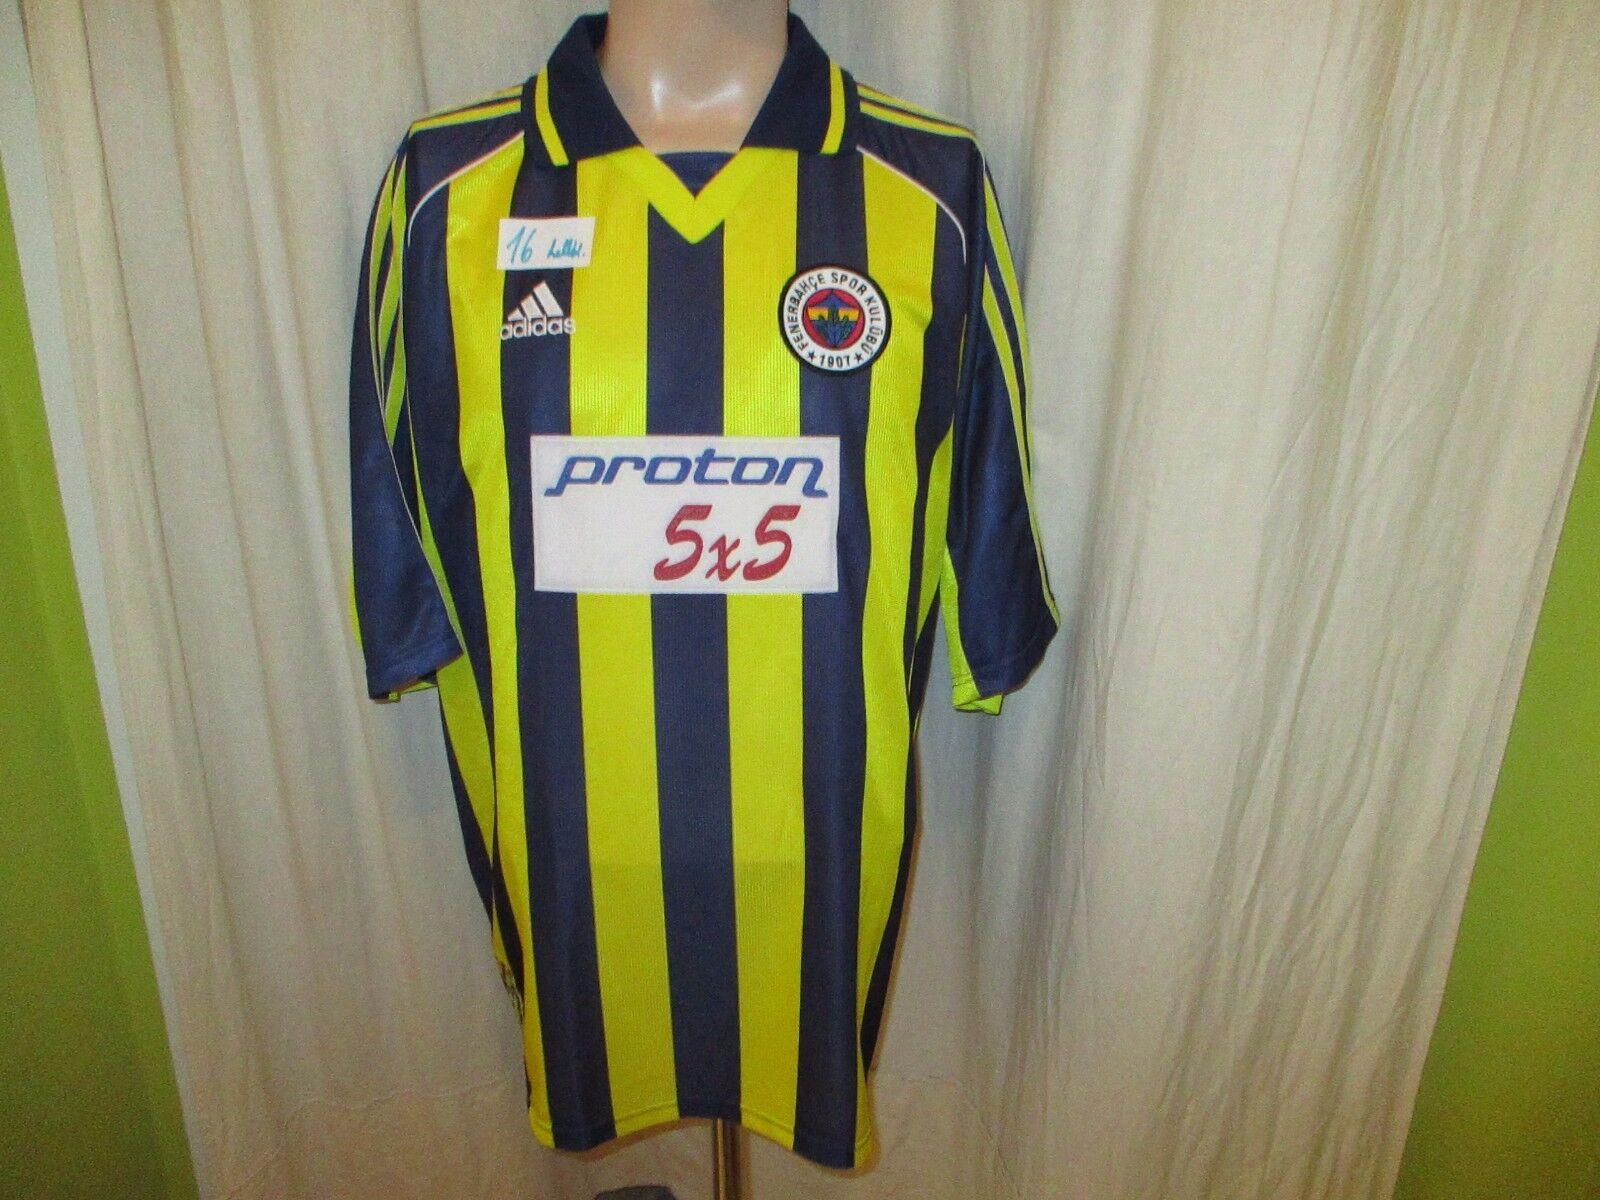 Fenerbahce Istanbul Original Adidas Trikot 1999 00  predon 5x5  Gr.XL TOP